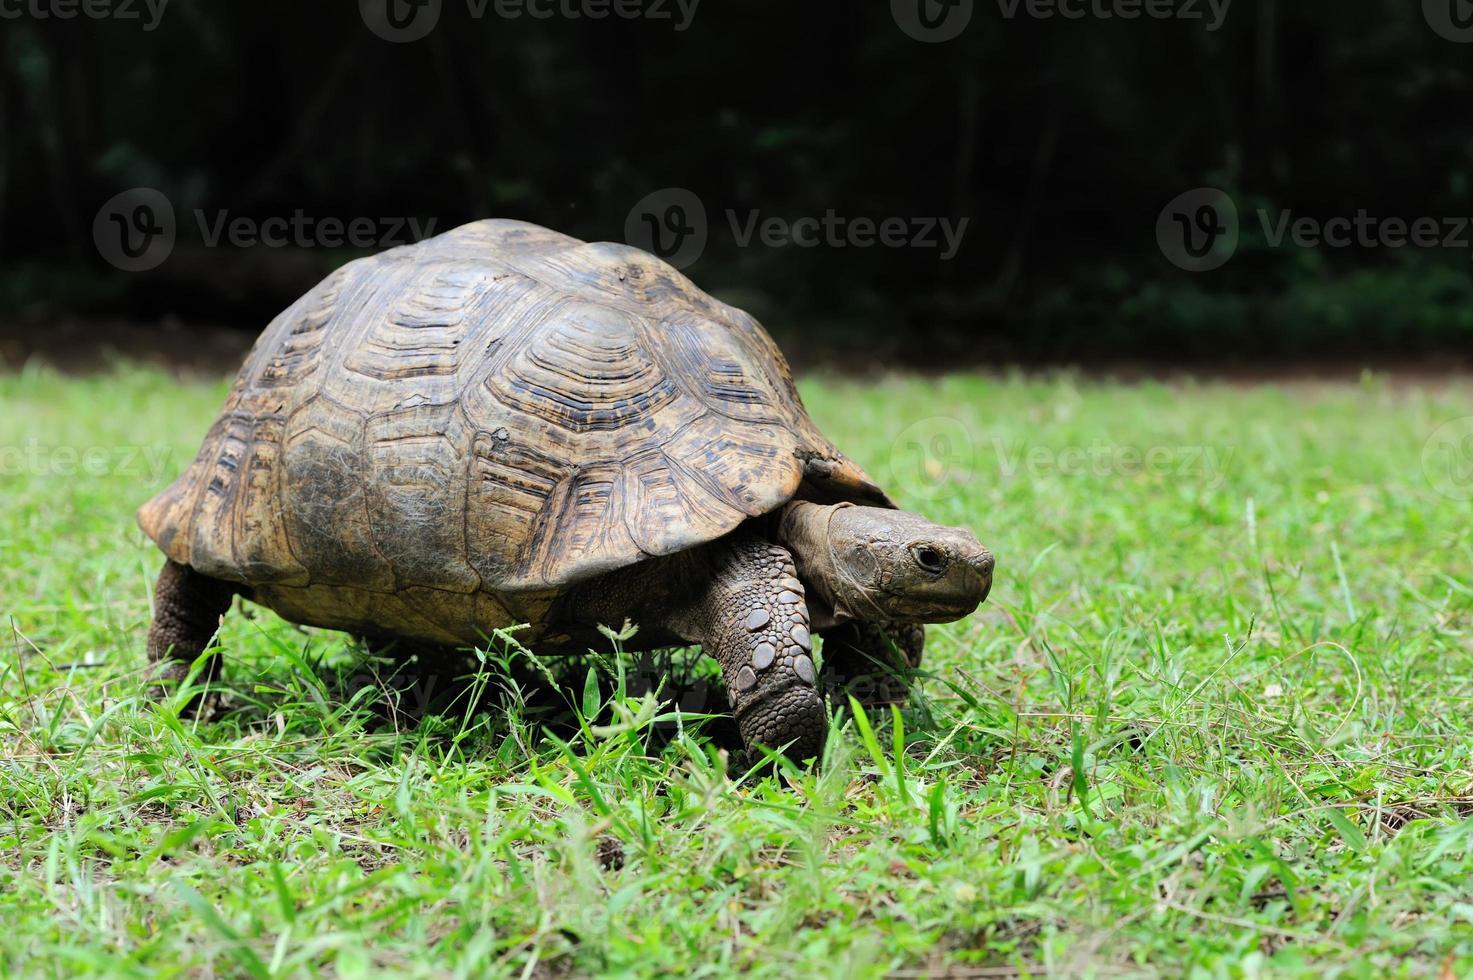 tartaruga de esporas africana na grama foto